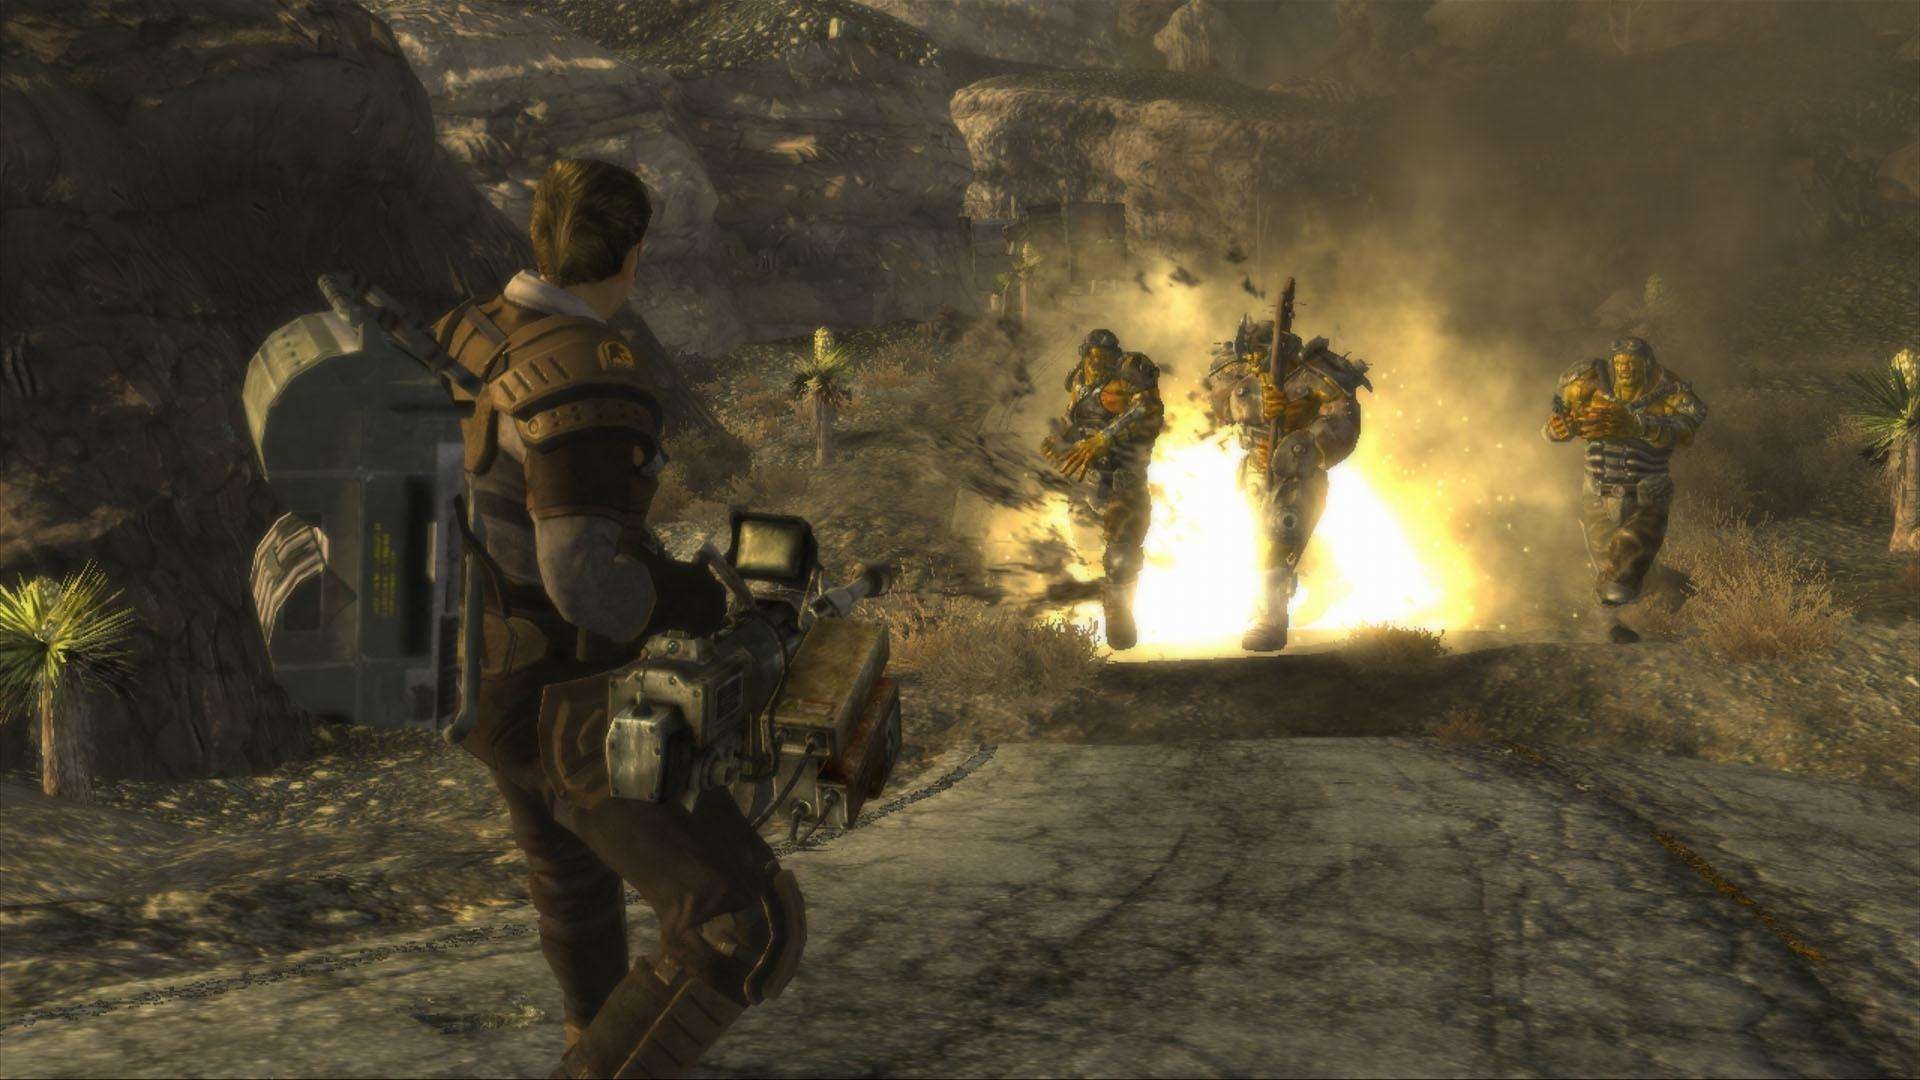 История серии игр Fallout - Раньше было лучше? Fallout New Vegas